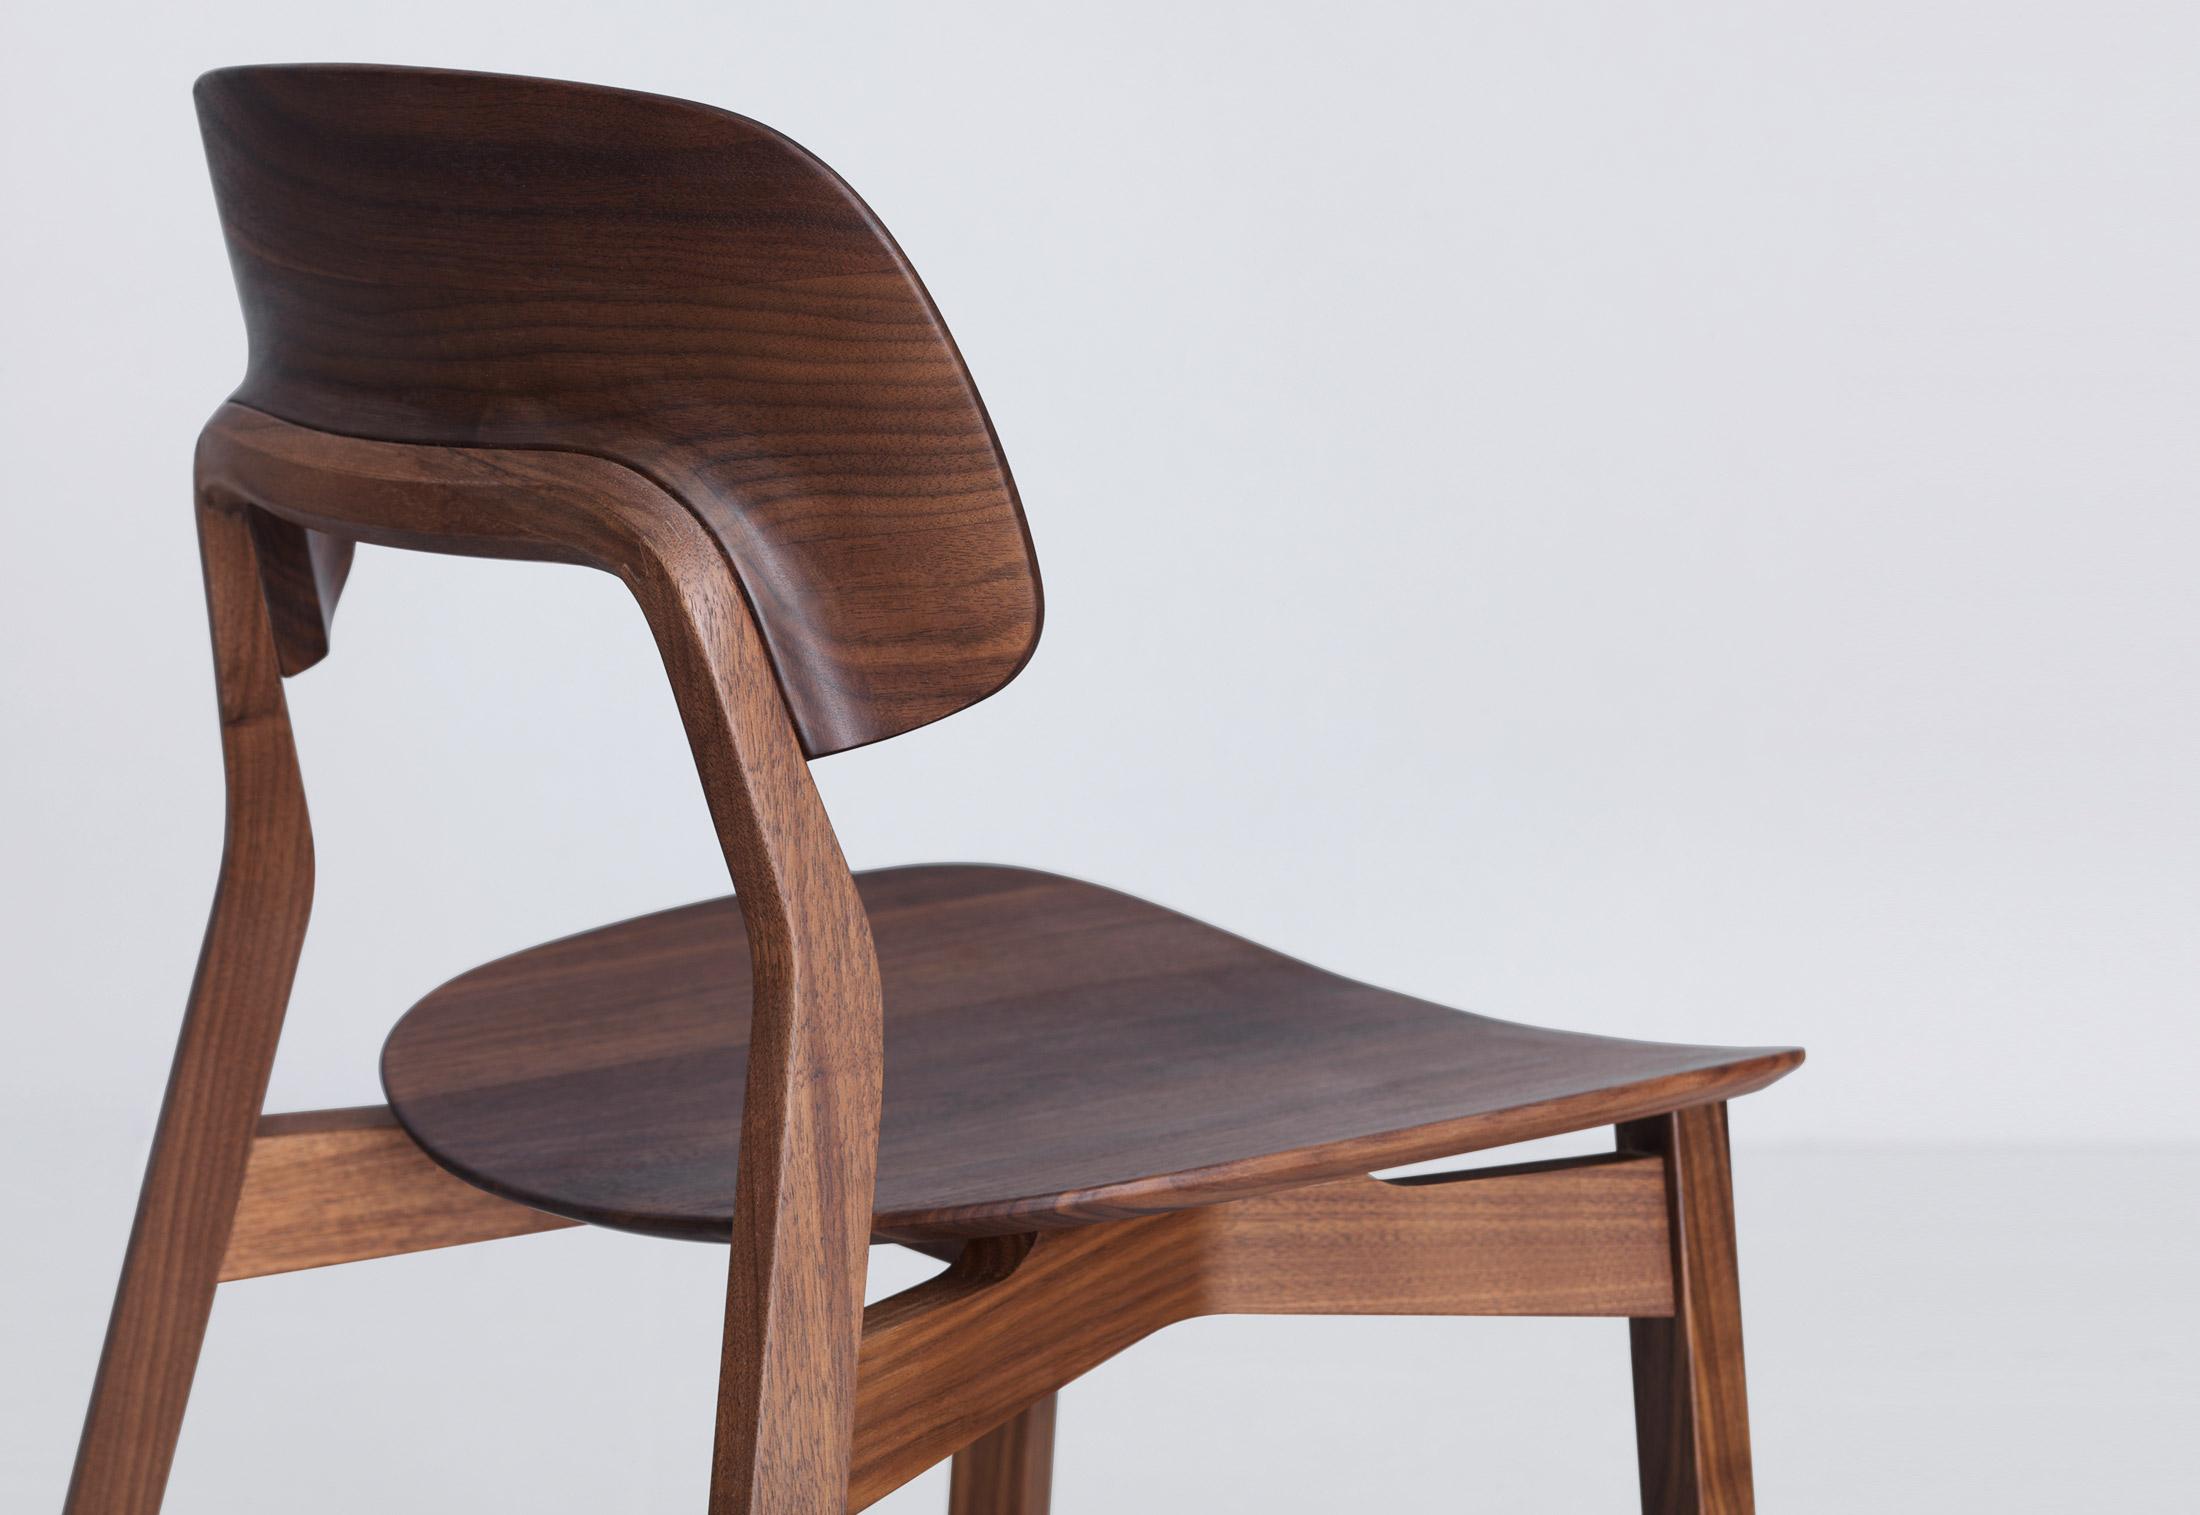 NONOTO Dining Chair by Zeitraum